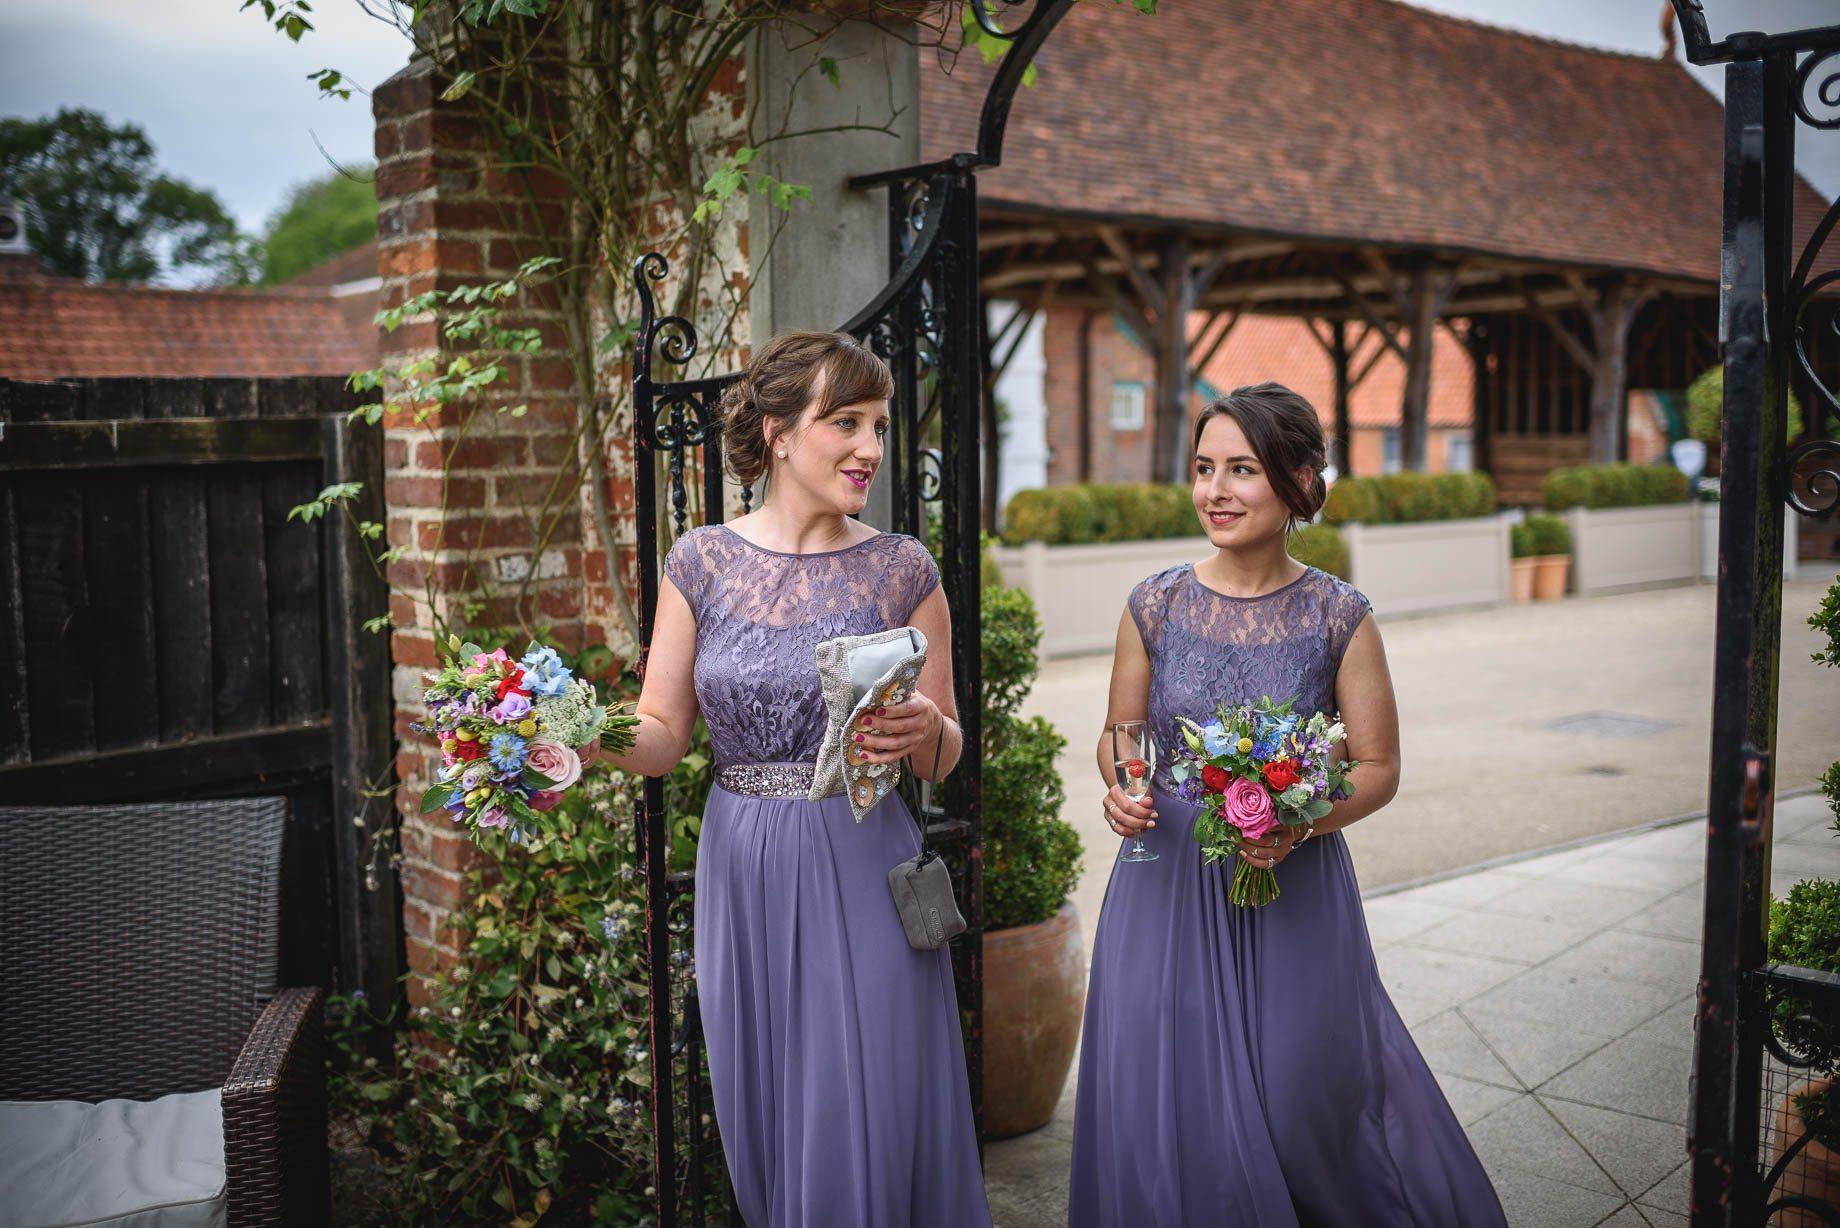 Gaynes Park wedding photography - Guy Collier Photography - Rachel and Jon (100 of 169)